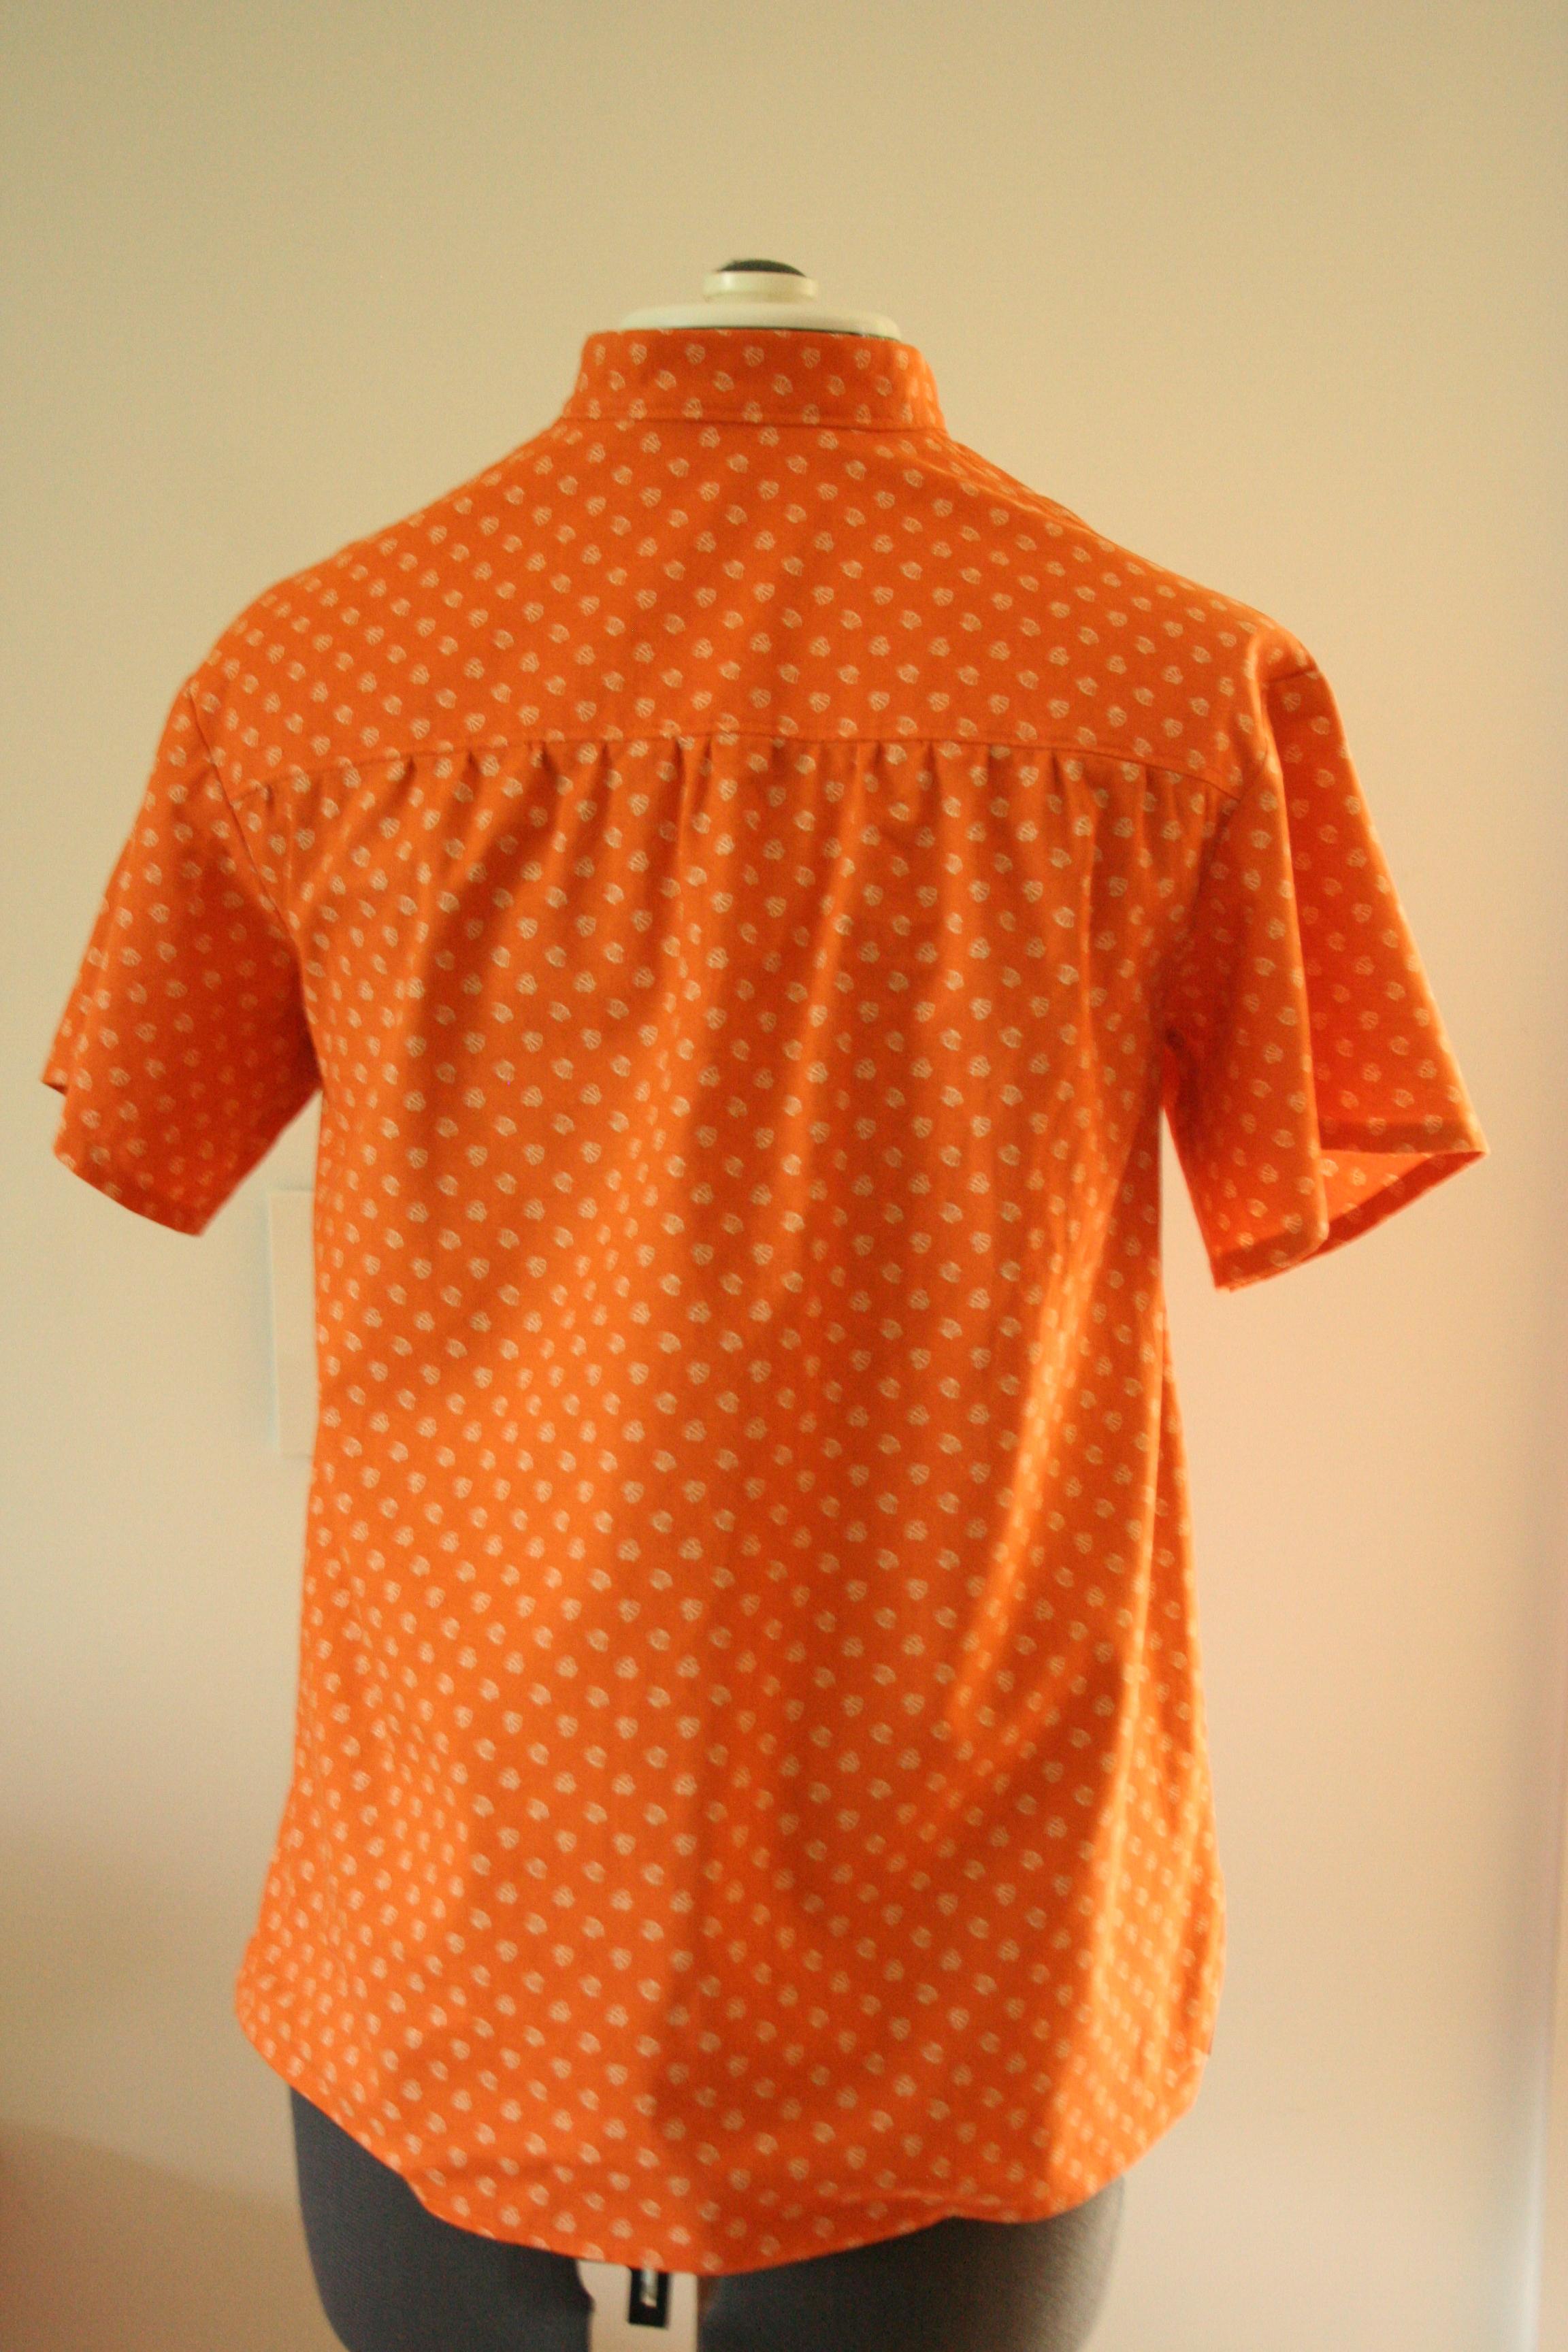 heidi pullover back on dressform